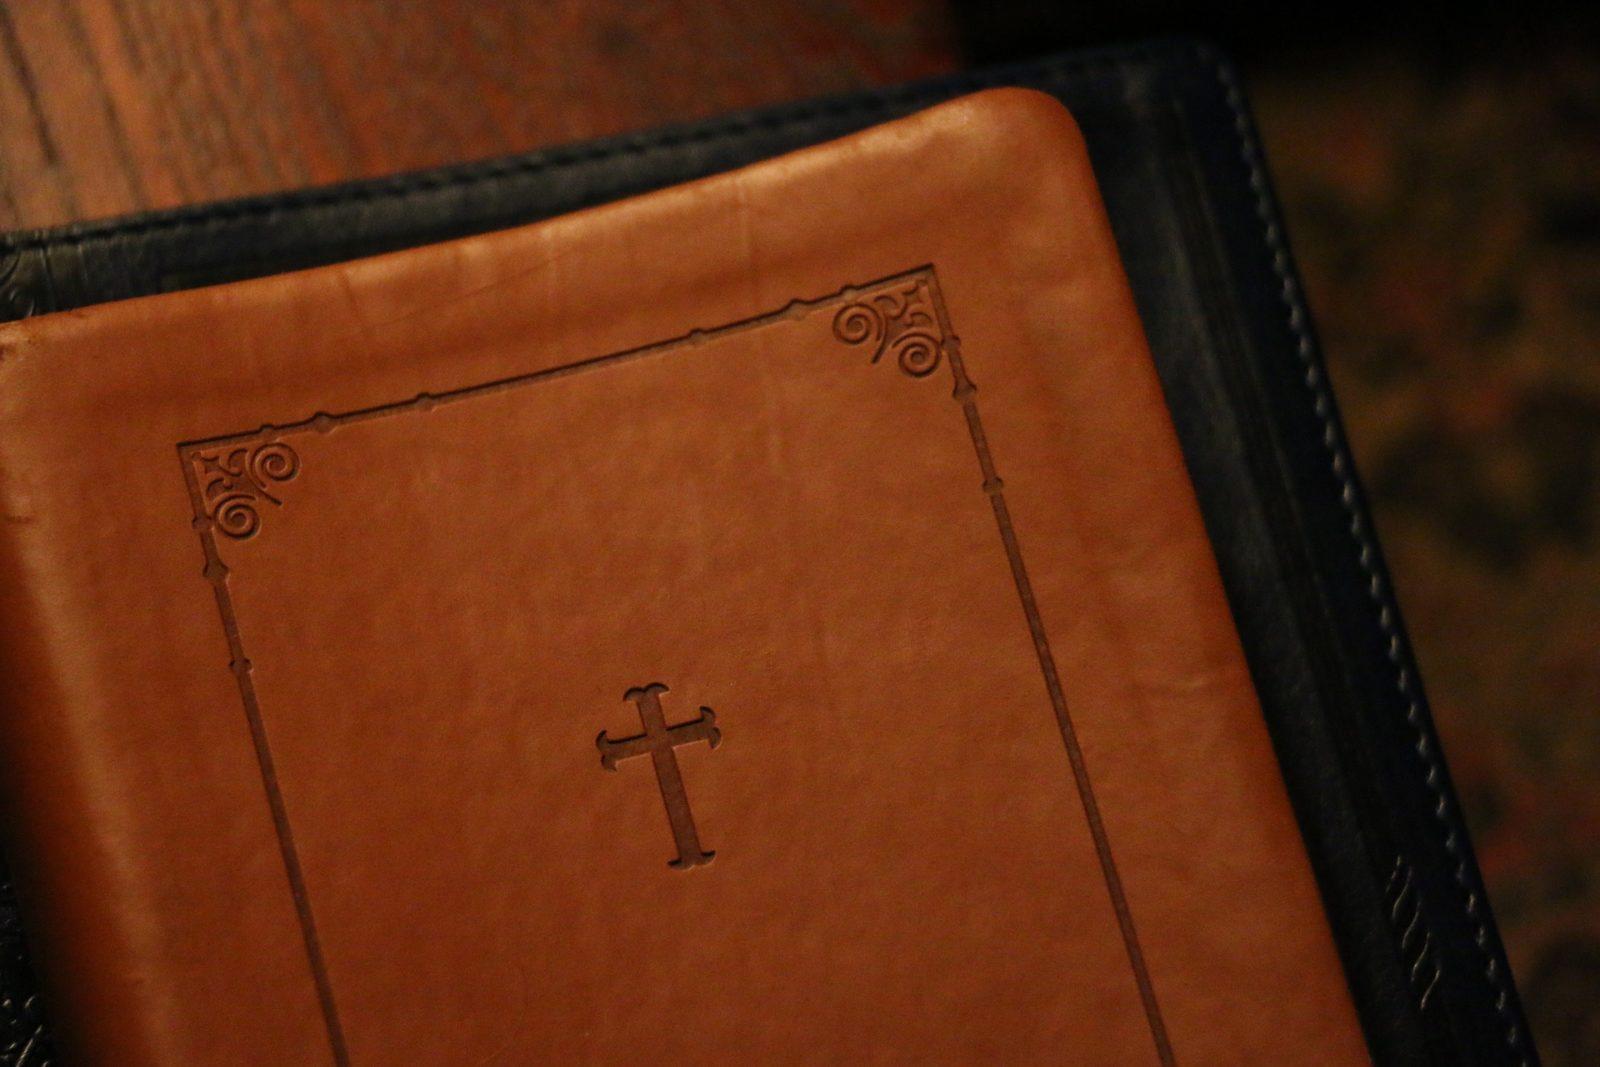 bible-1245795_1920